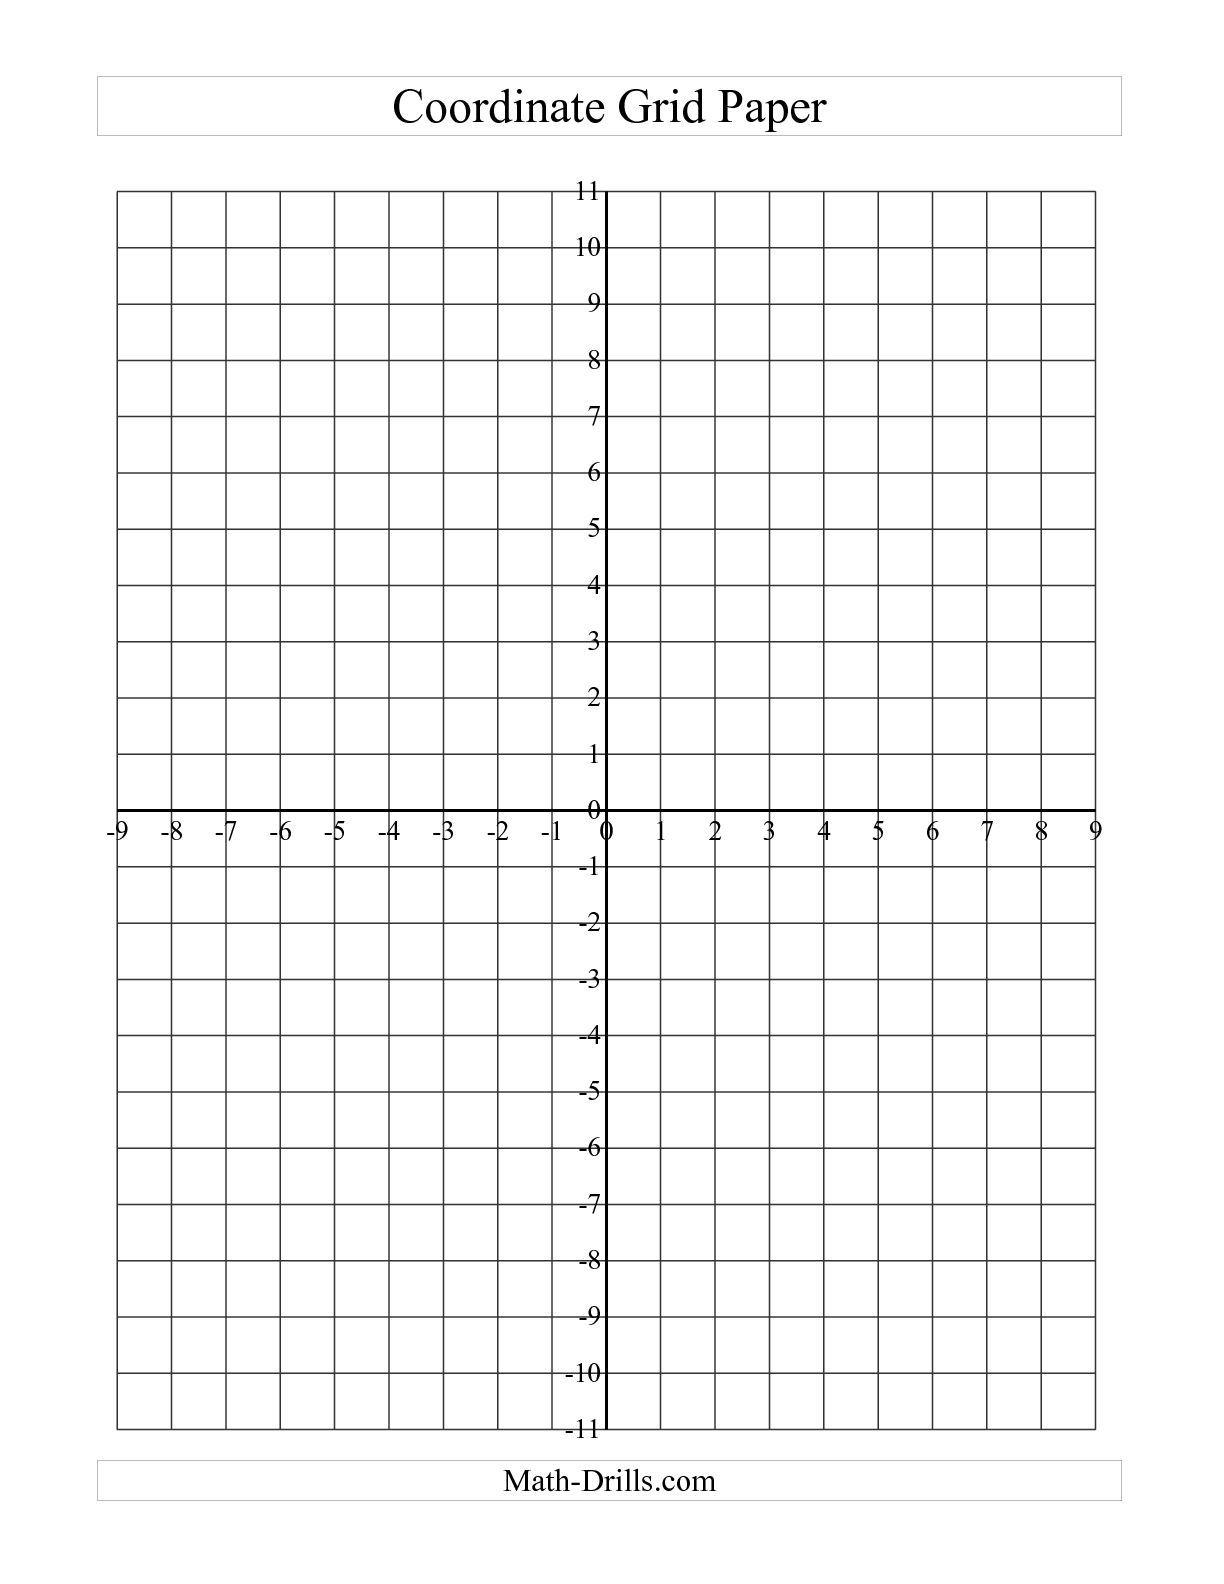 Free Coordinate Grid Worksheets - Siteraven - Free Printable Coordinate Grid Worksheets